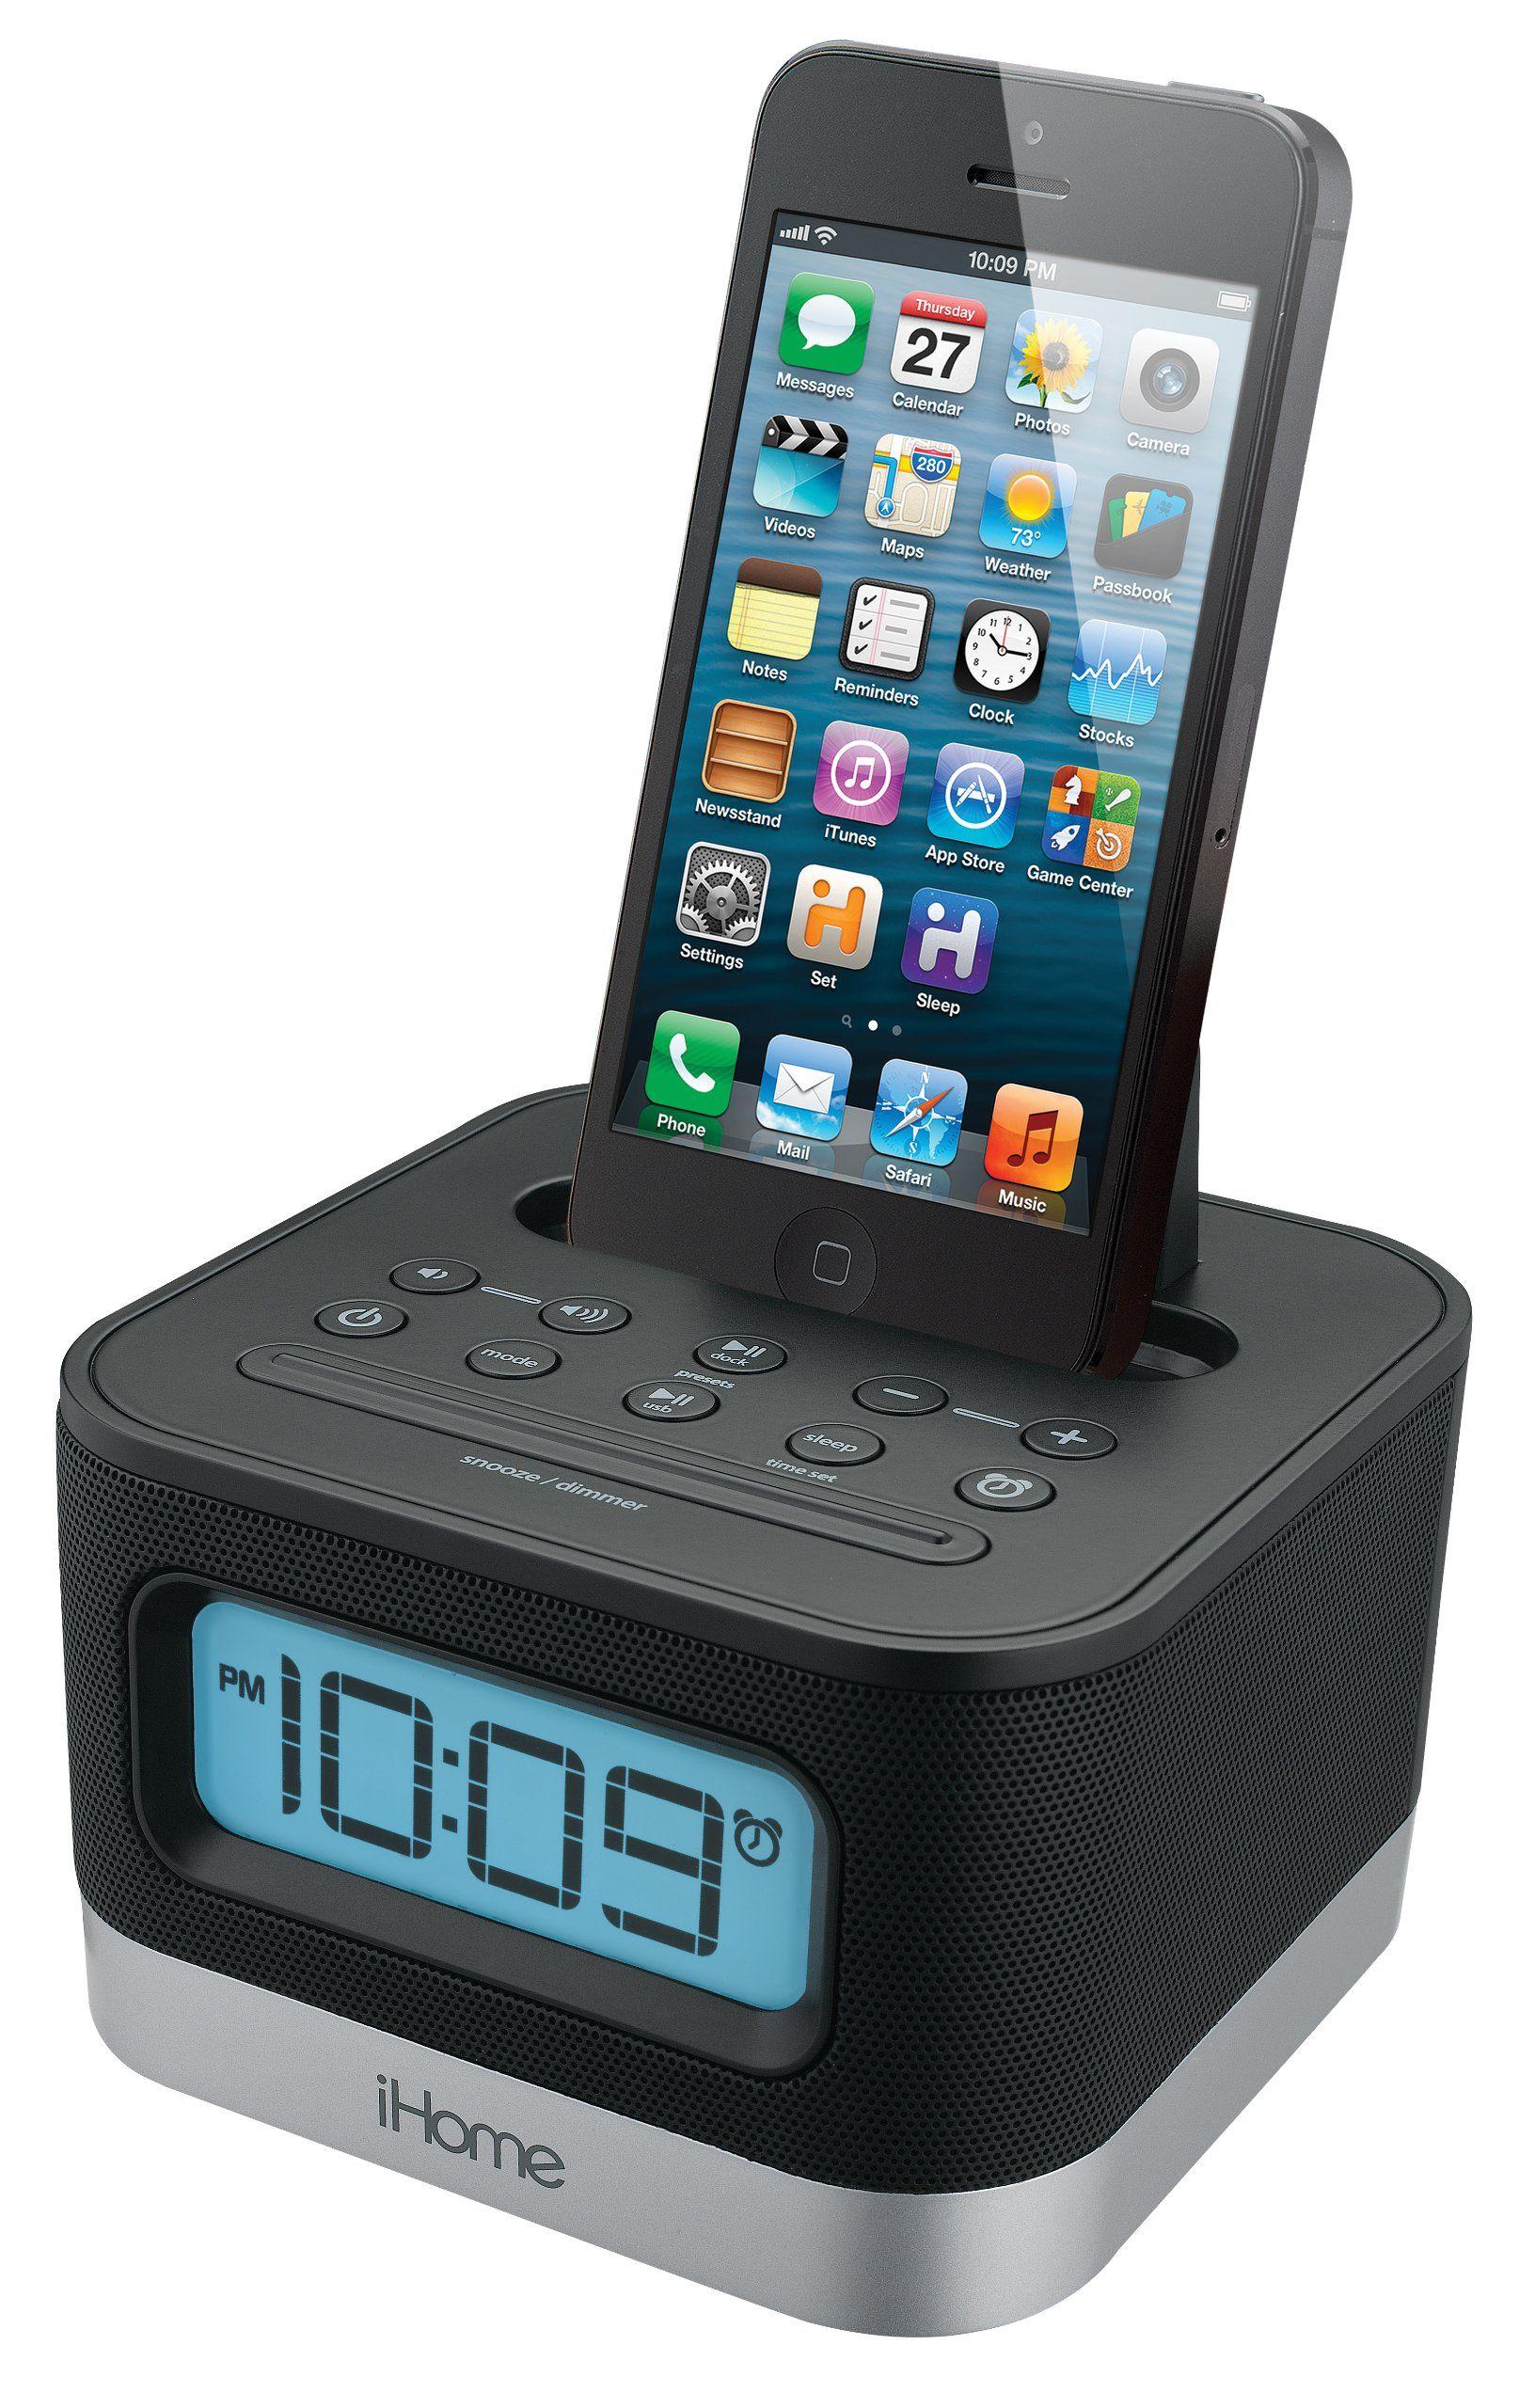 Ihome Stereo Fm Clock Radio